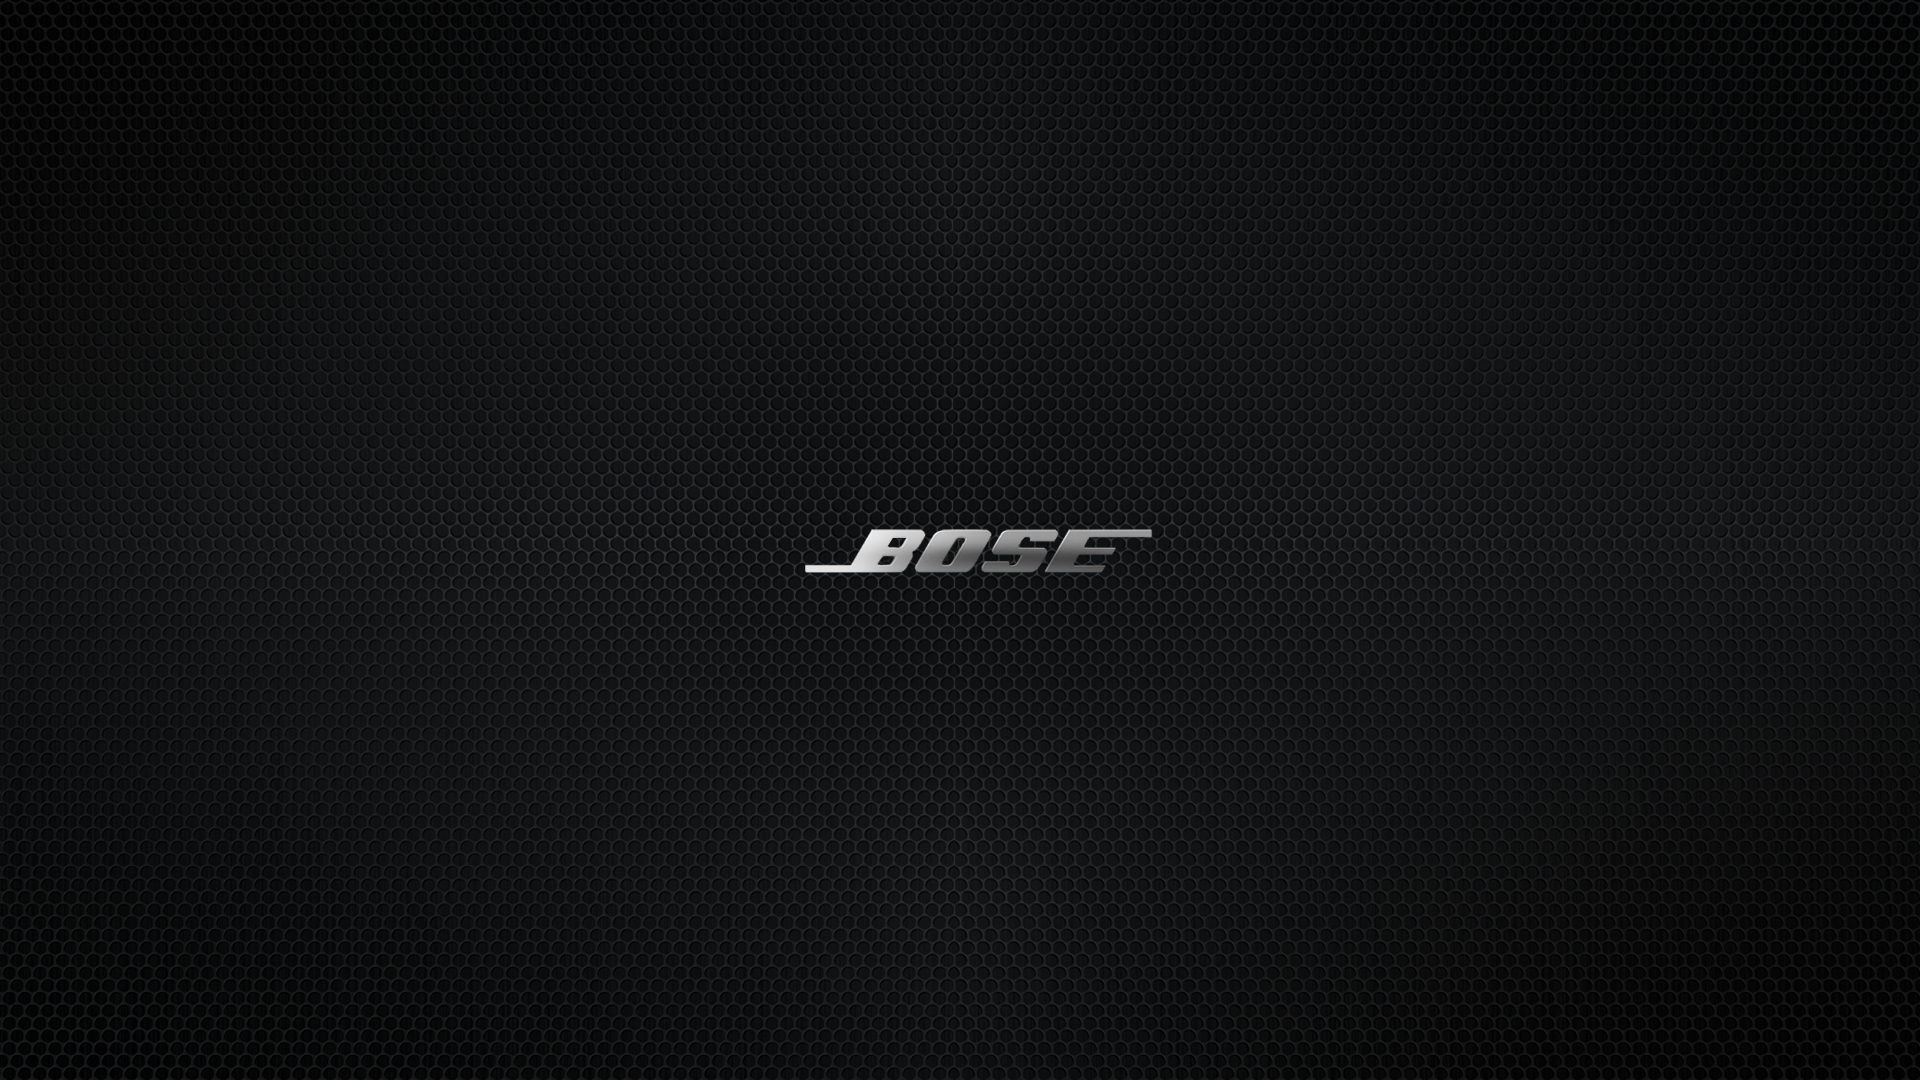 bose_10.jpg